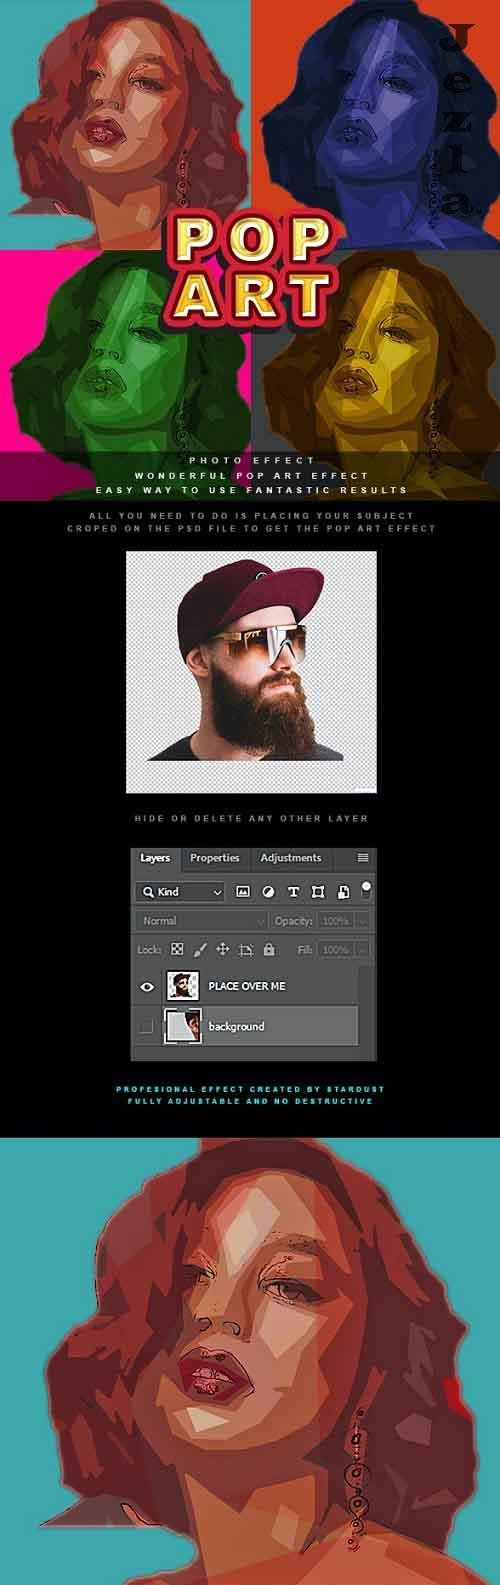 GraphicRiver - Pop Art Photo Effect 28673407